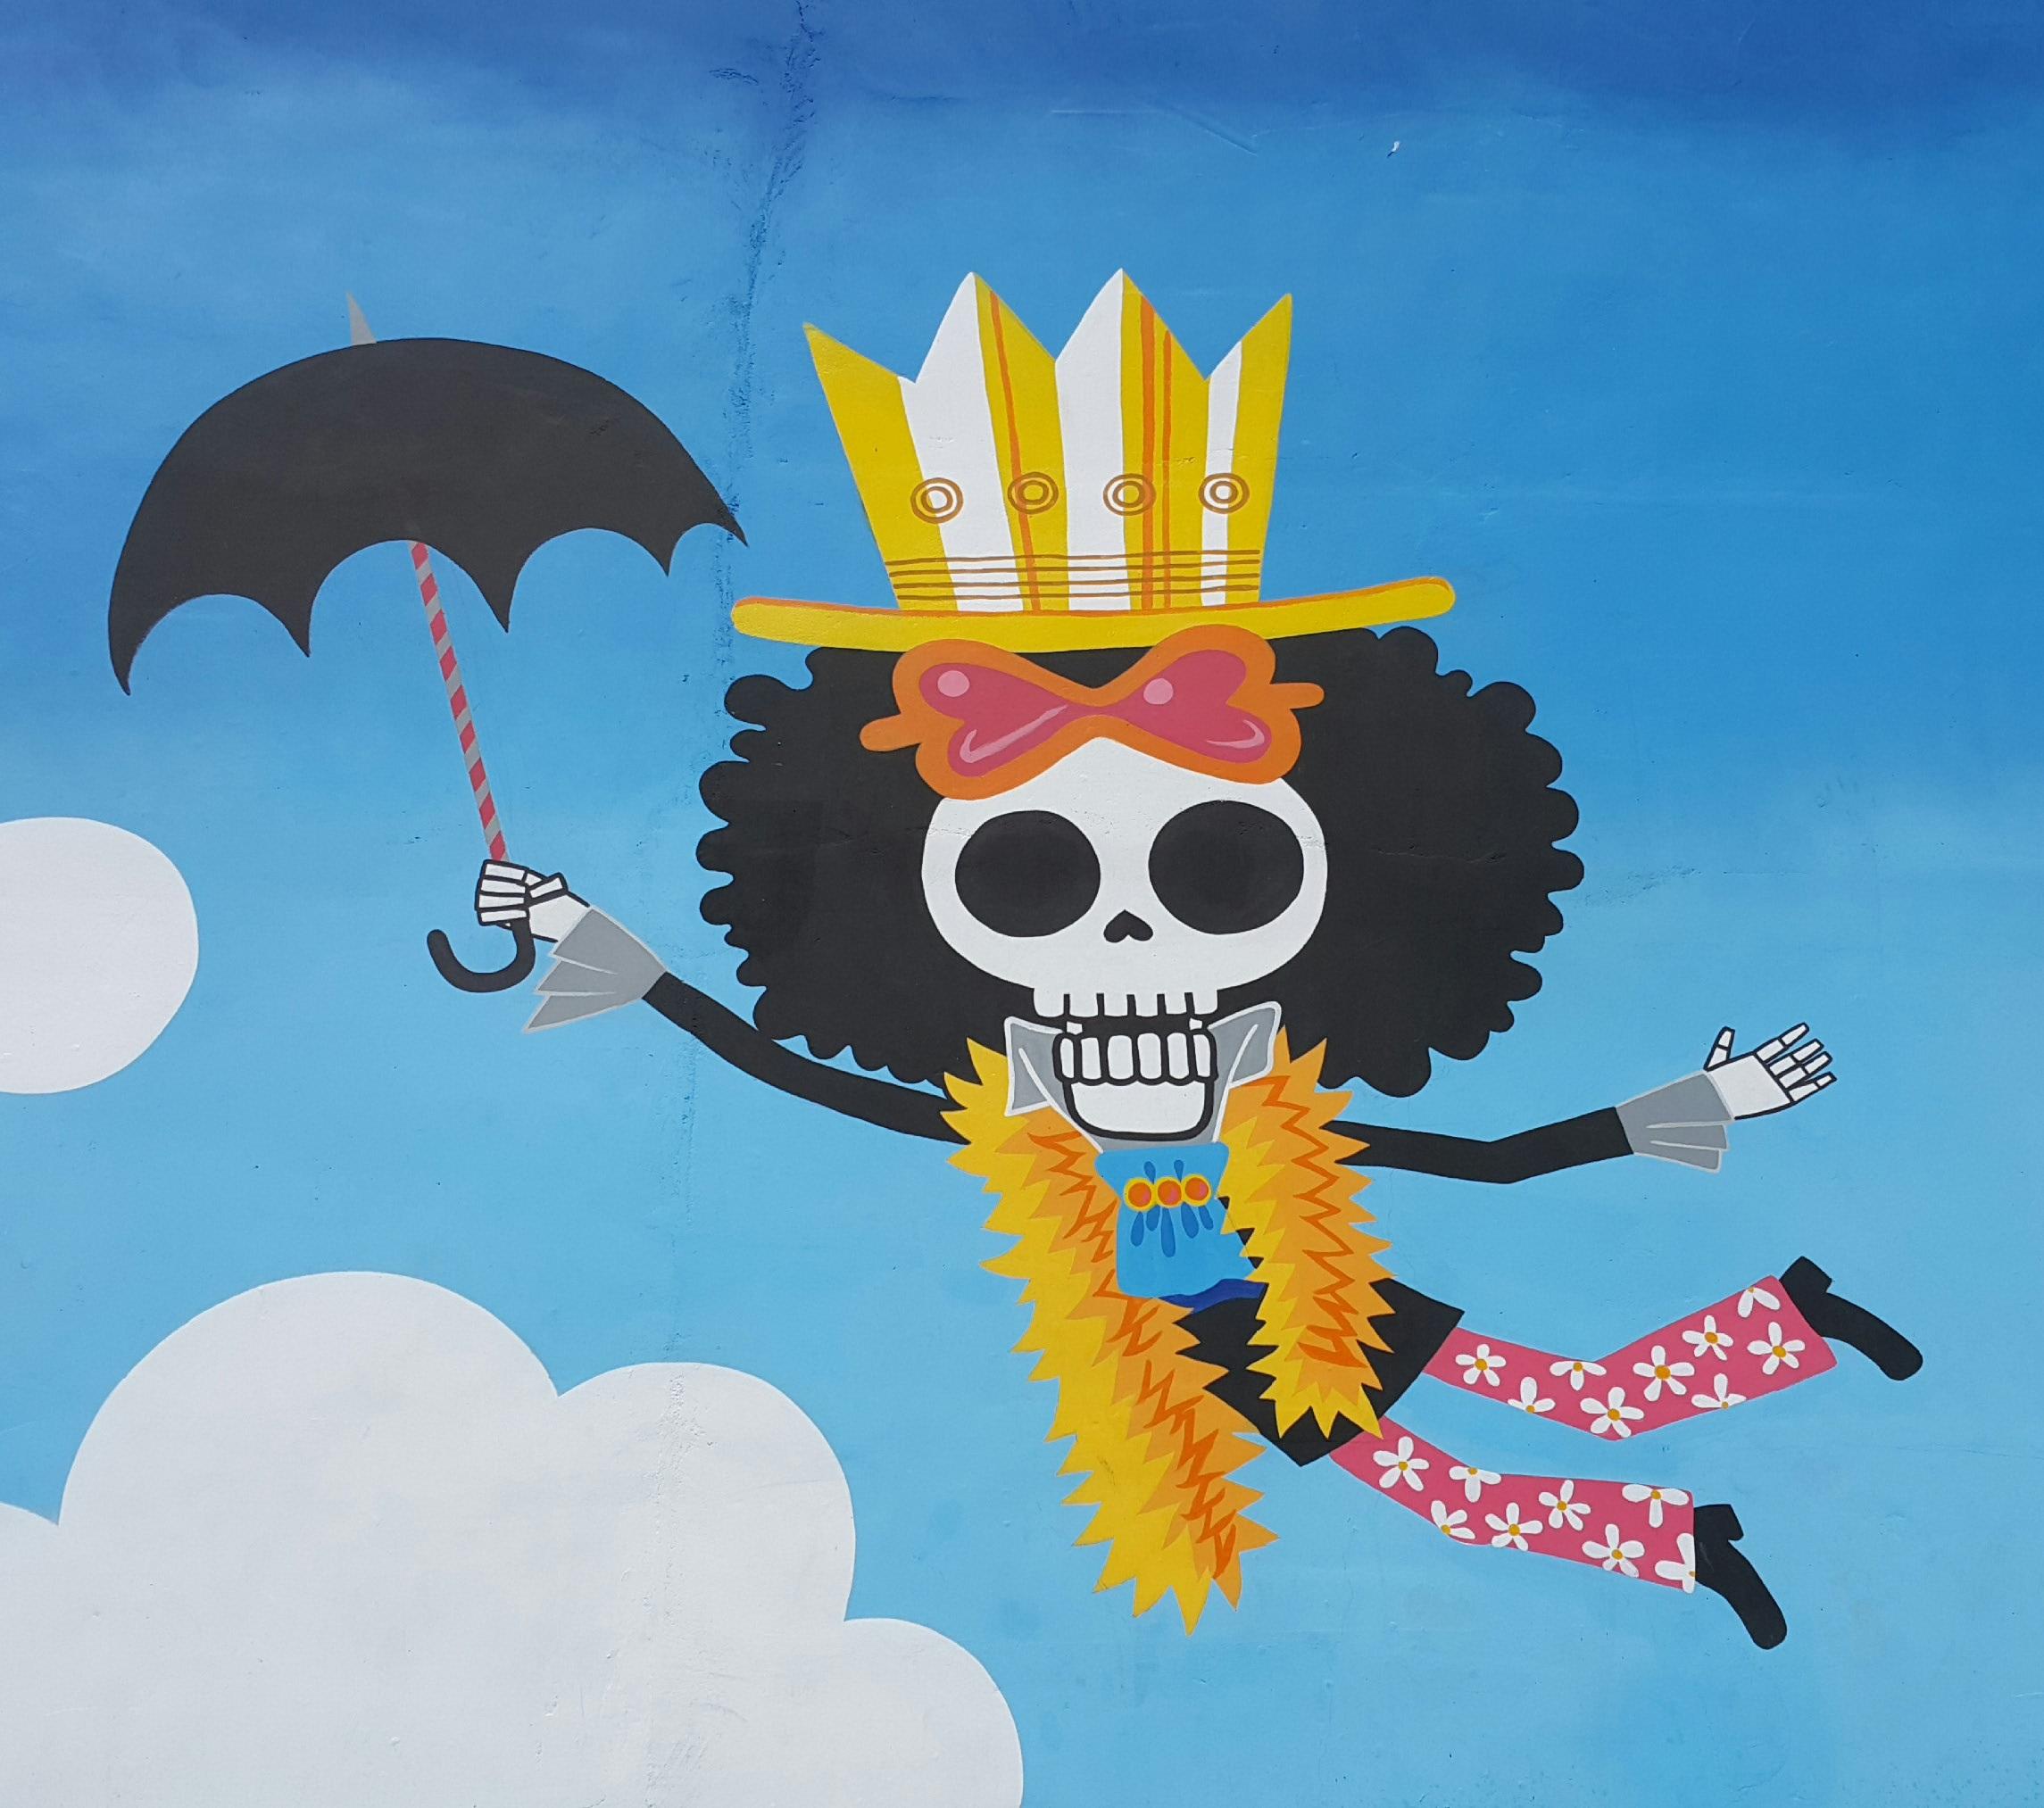 caravera, paraguas, hortera, payaso, volar - Fondos de Pantalla HD - professor-falken.com